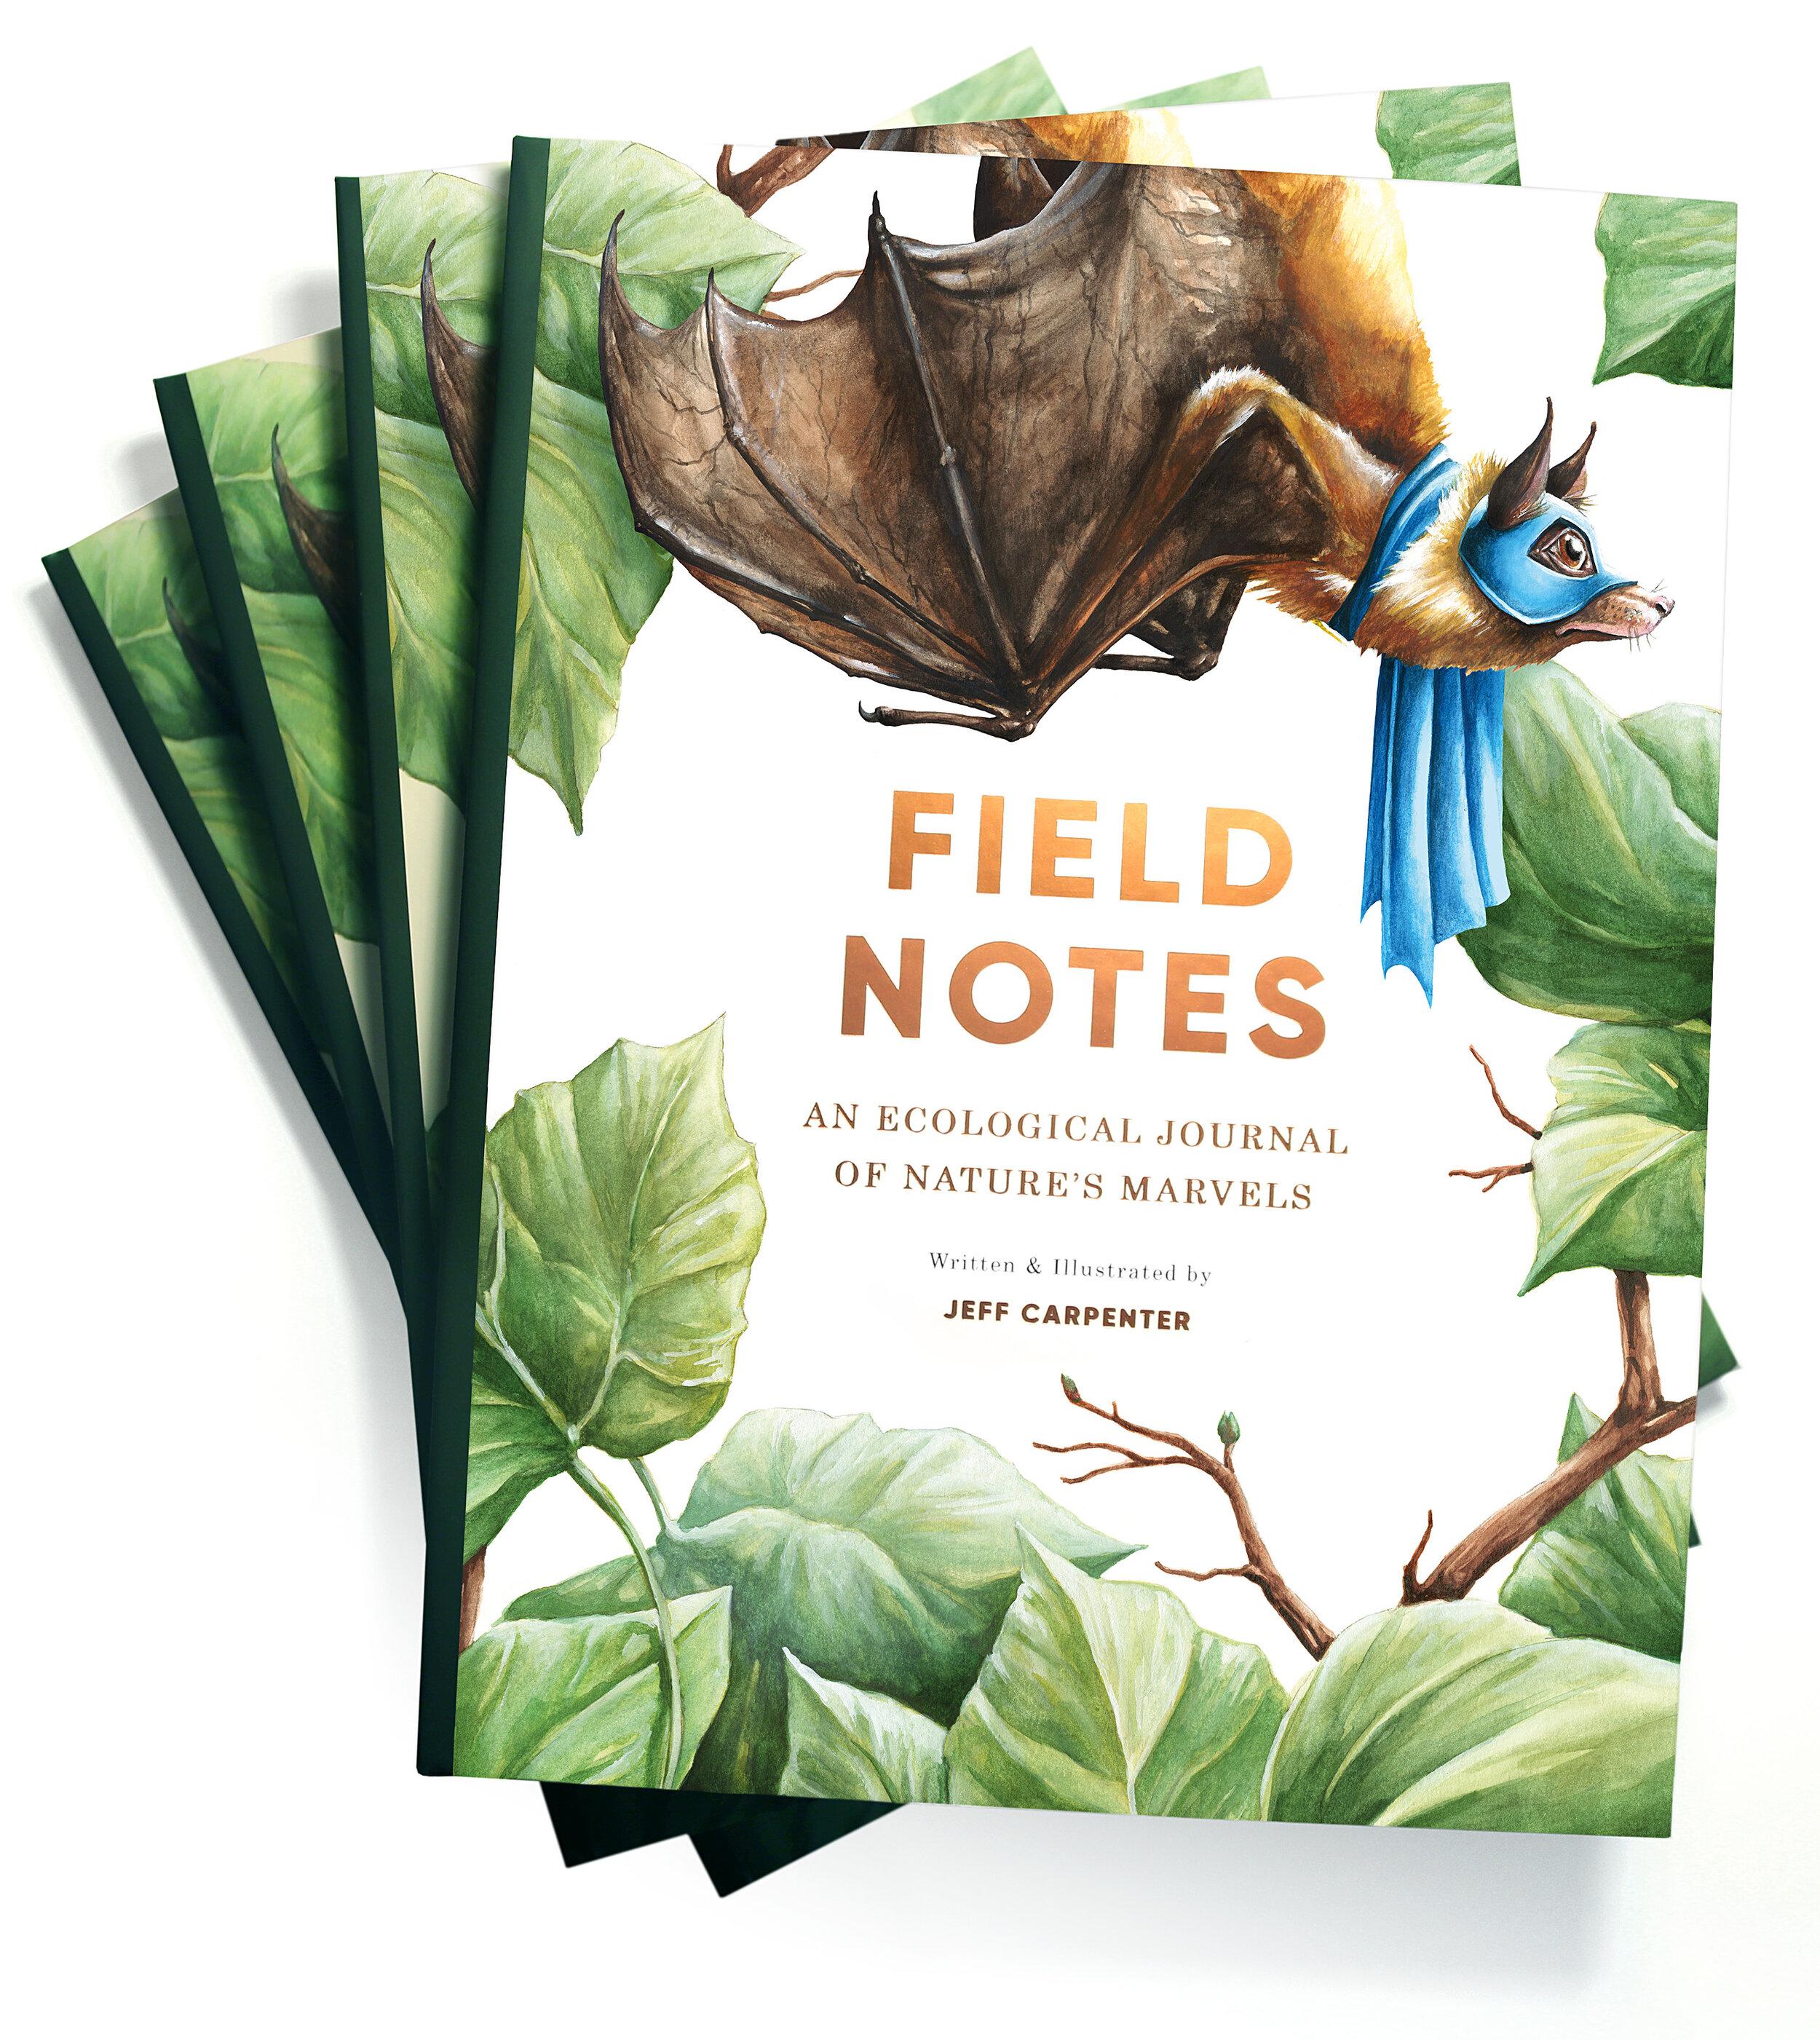 FieldNotes_BookPic1.jpg